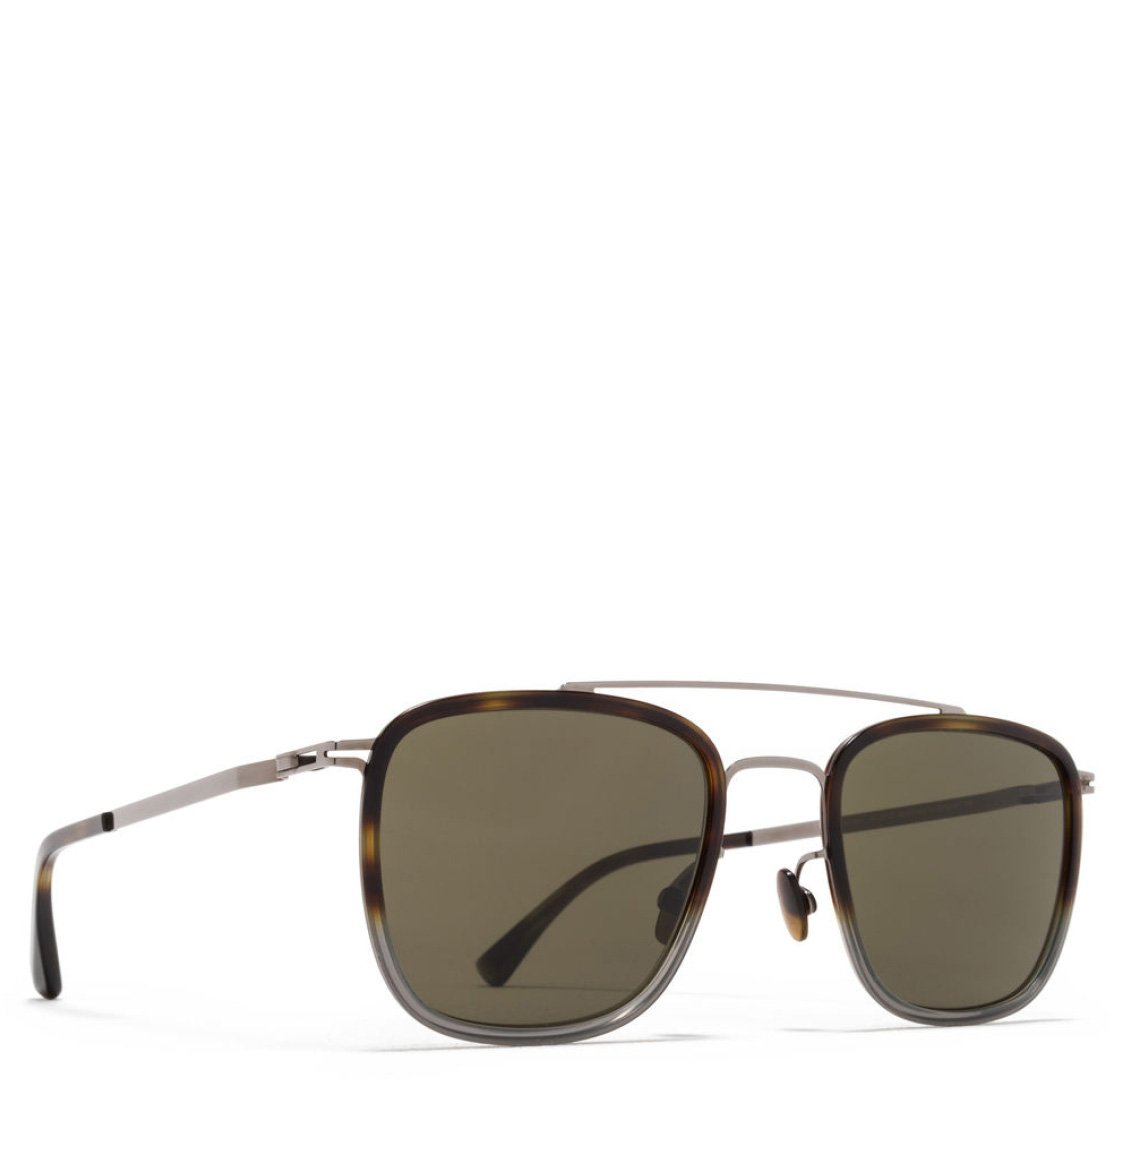 Mykita Aviator-Frame Shiny Graphite Γυαλιά Ηλίου 1050866